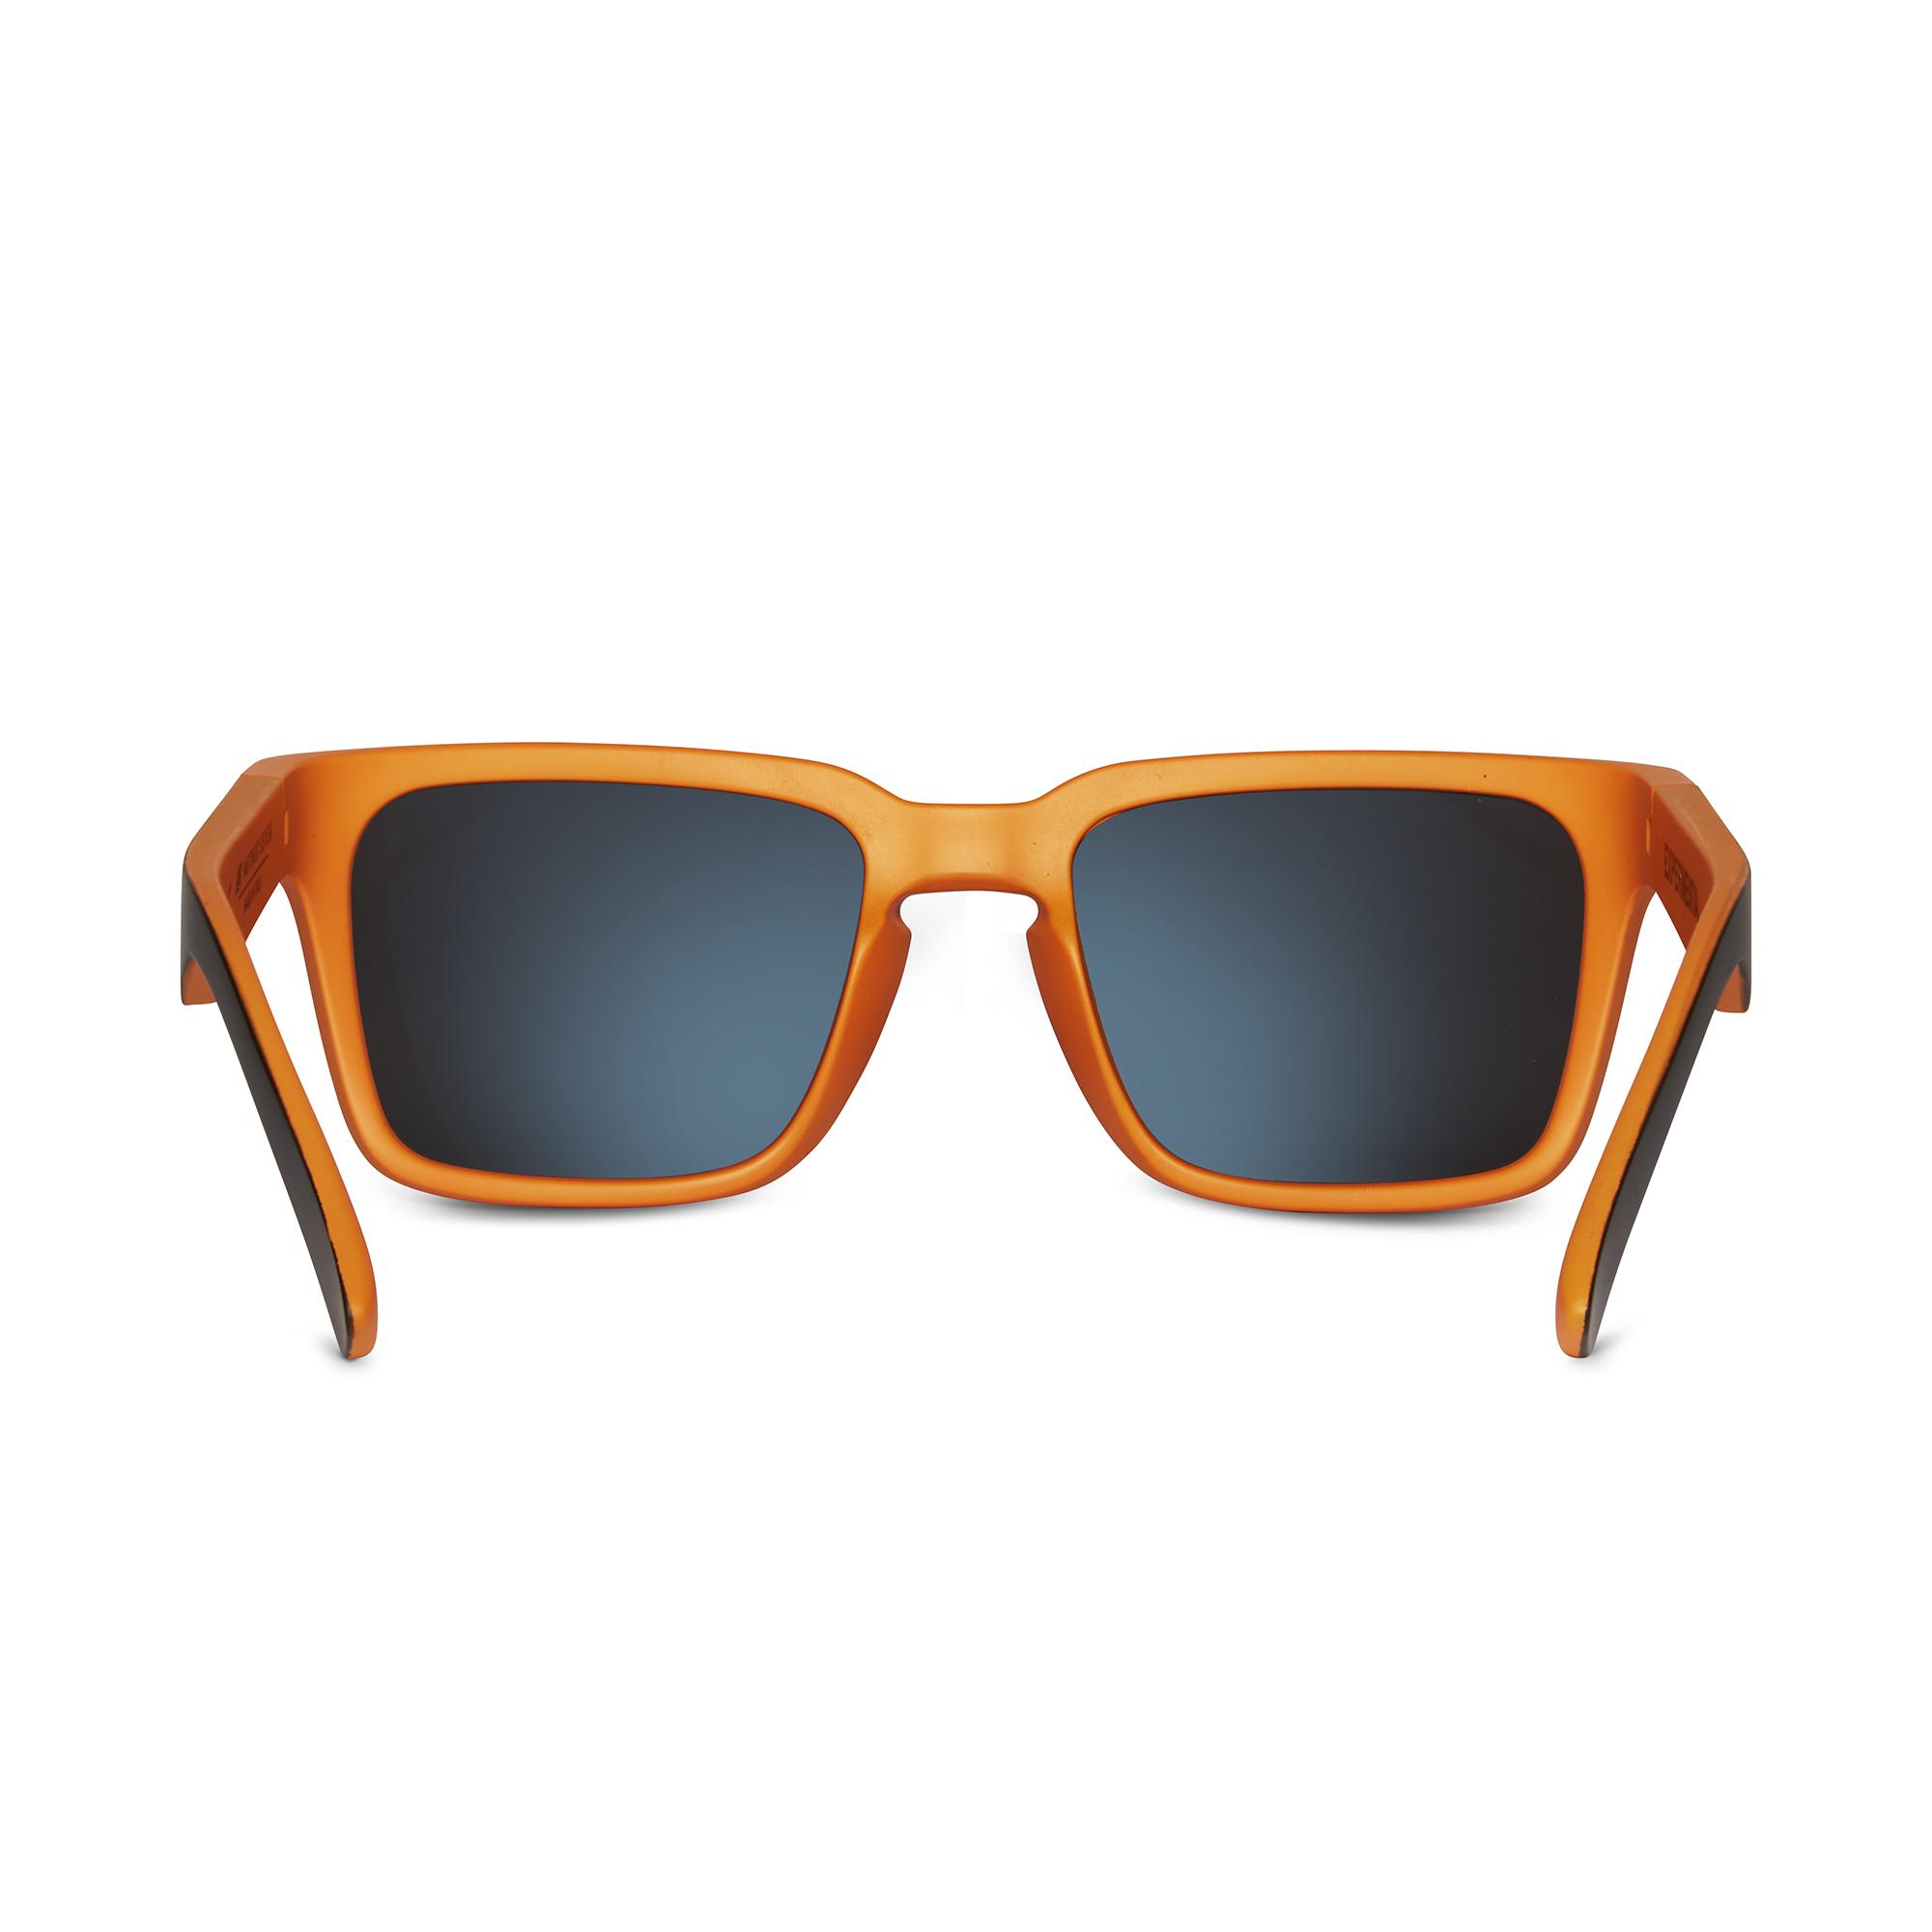 Experimental Edition Evolution FLT Sunglasses - Back